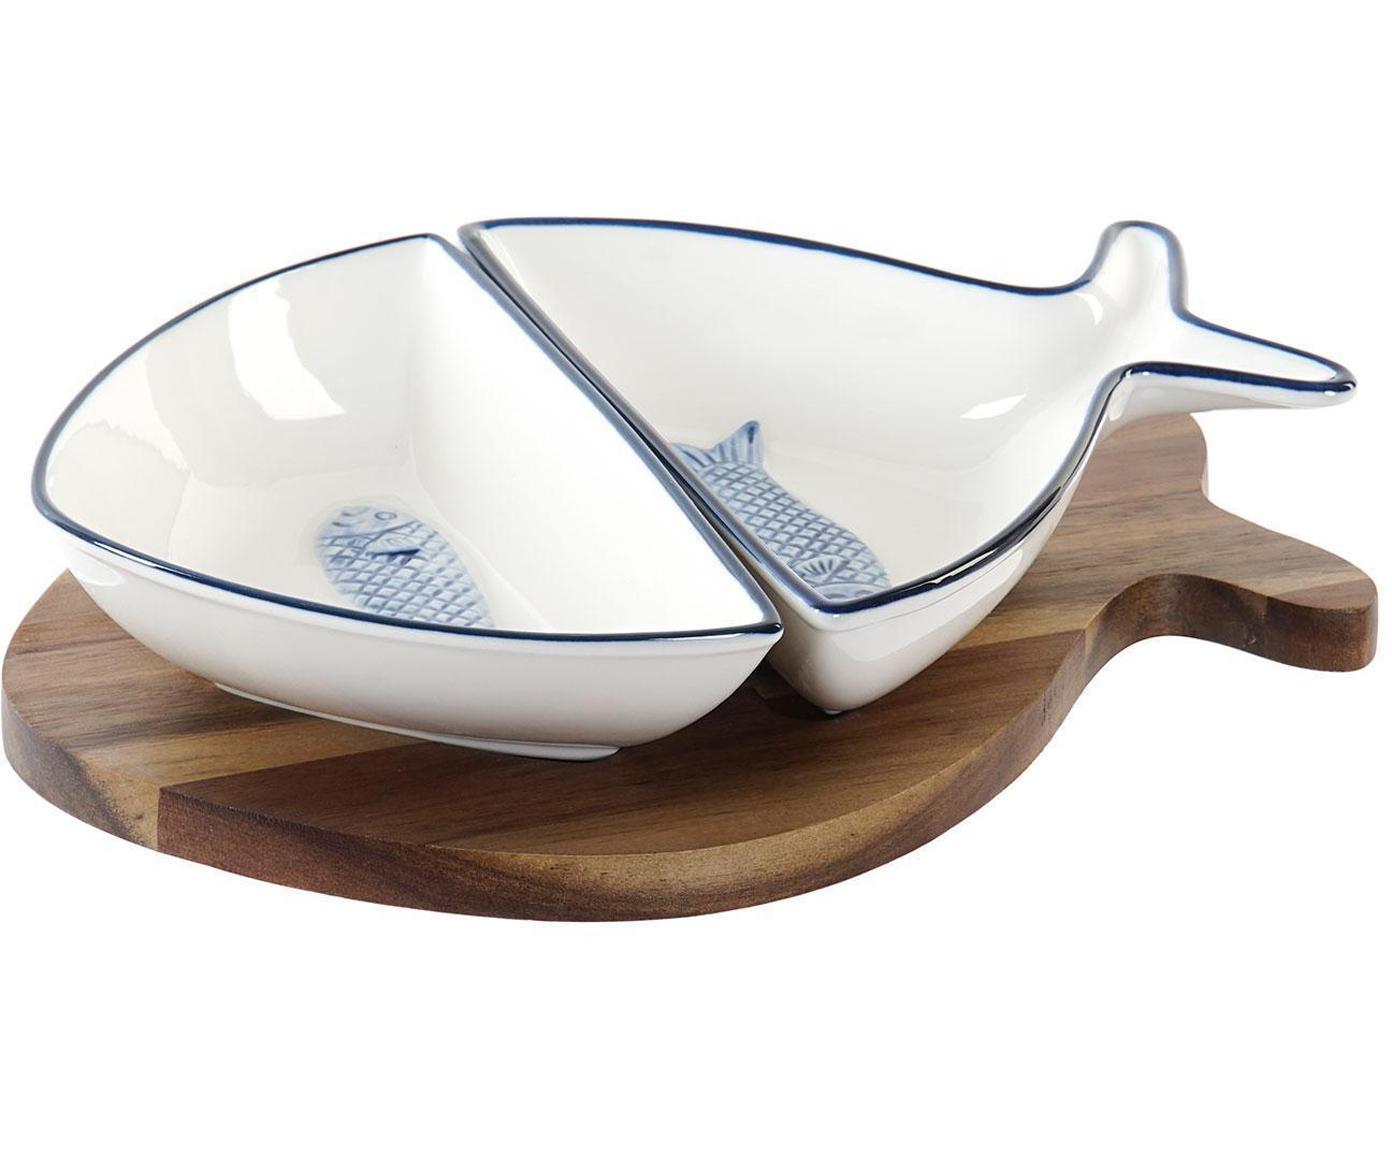 Set de servir Ryba, 3pzas., Cuencos: Porcelana, Bandeja: Madera de acacia, Blanco, azul, An 24 x Al 5 cm